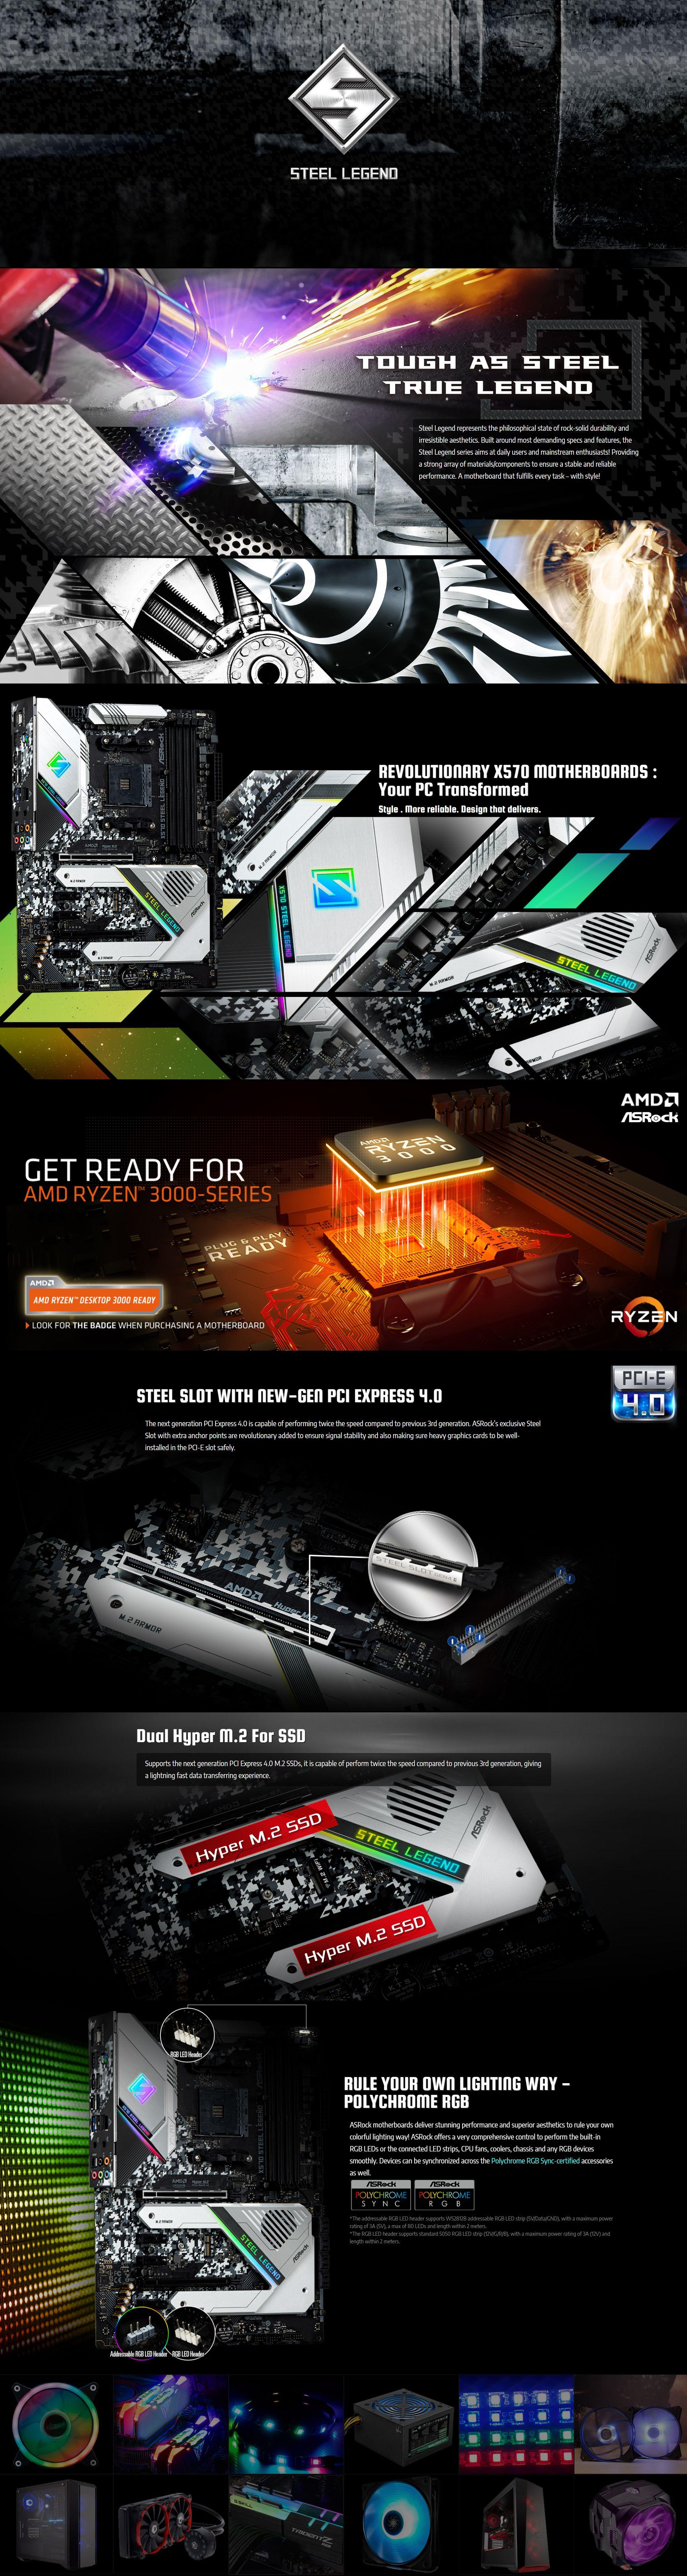 ASRock X570 Steel Legend AM4 ATX Motherboard